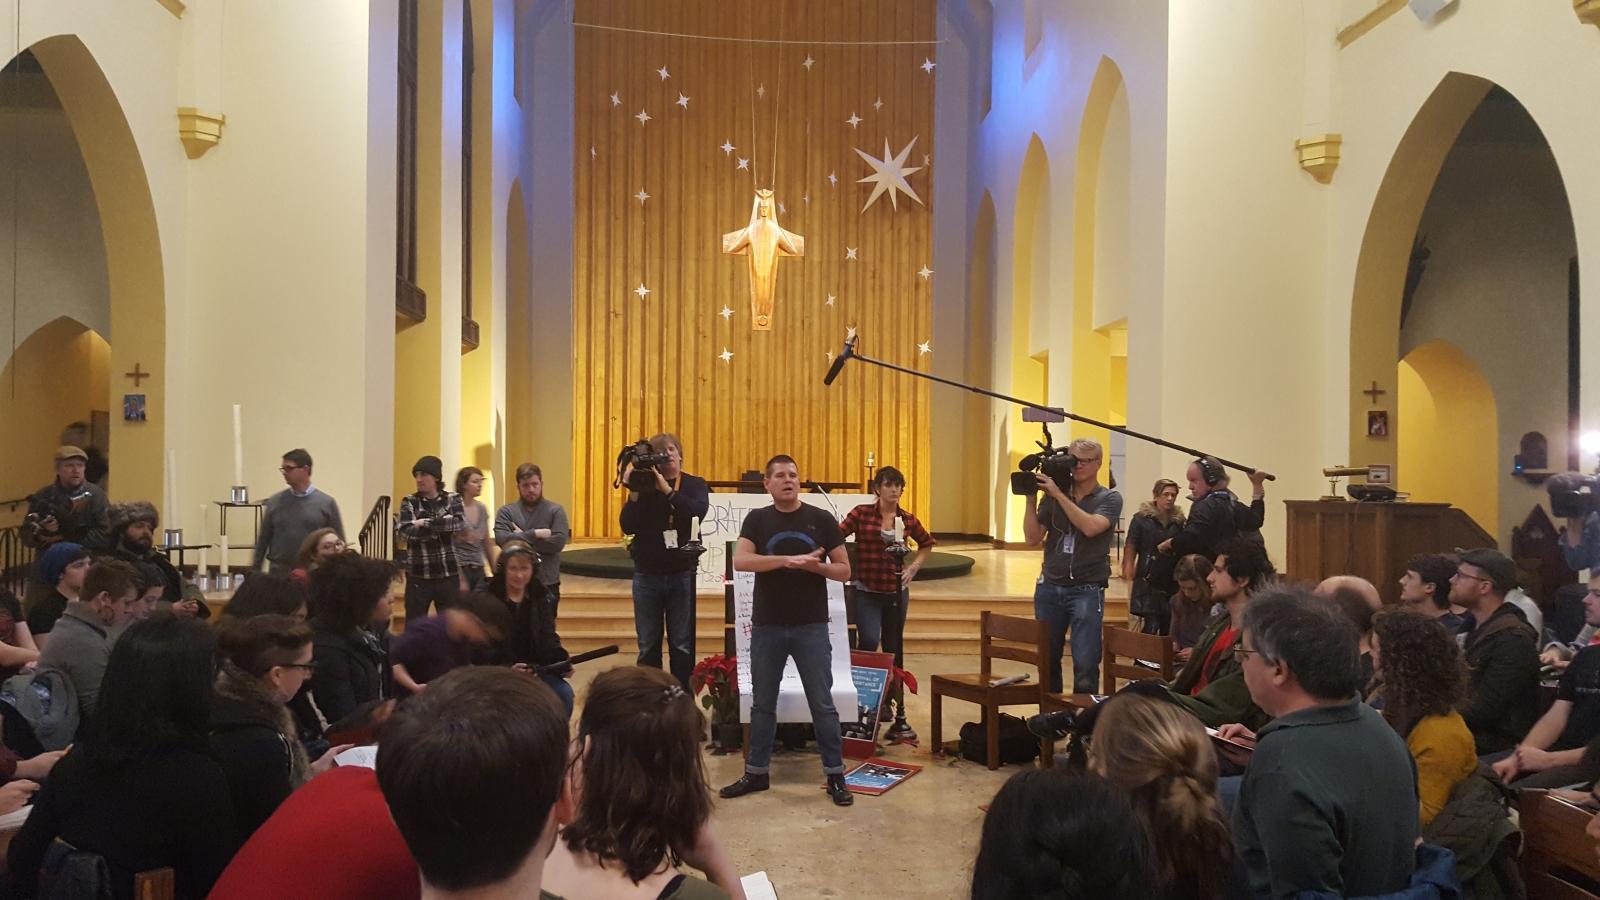 DisruptJ20 organiser speaks in a church